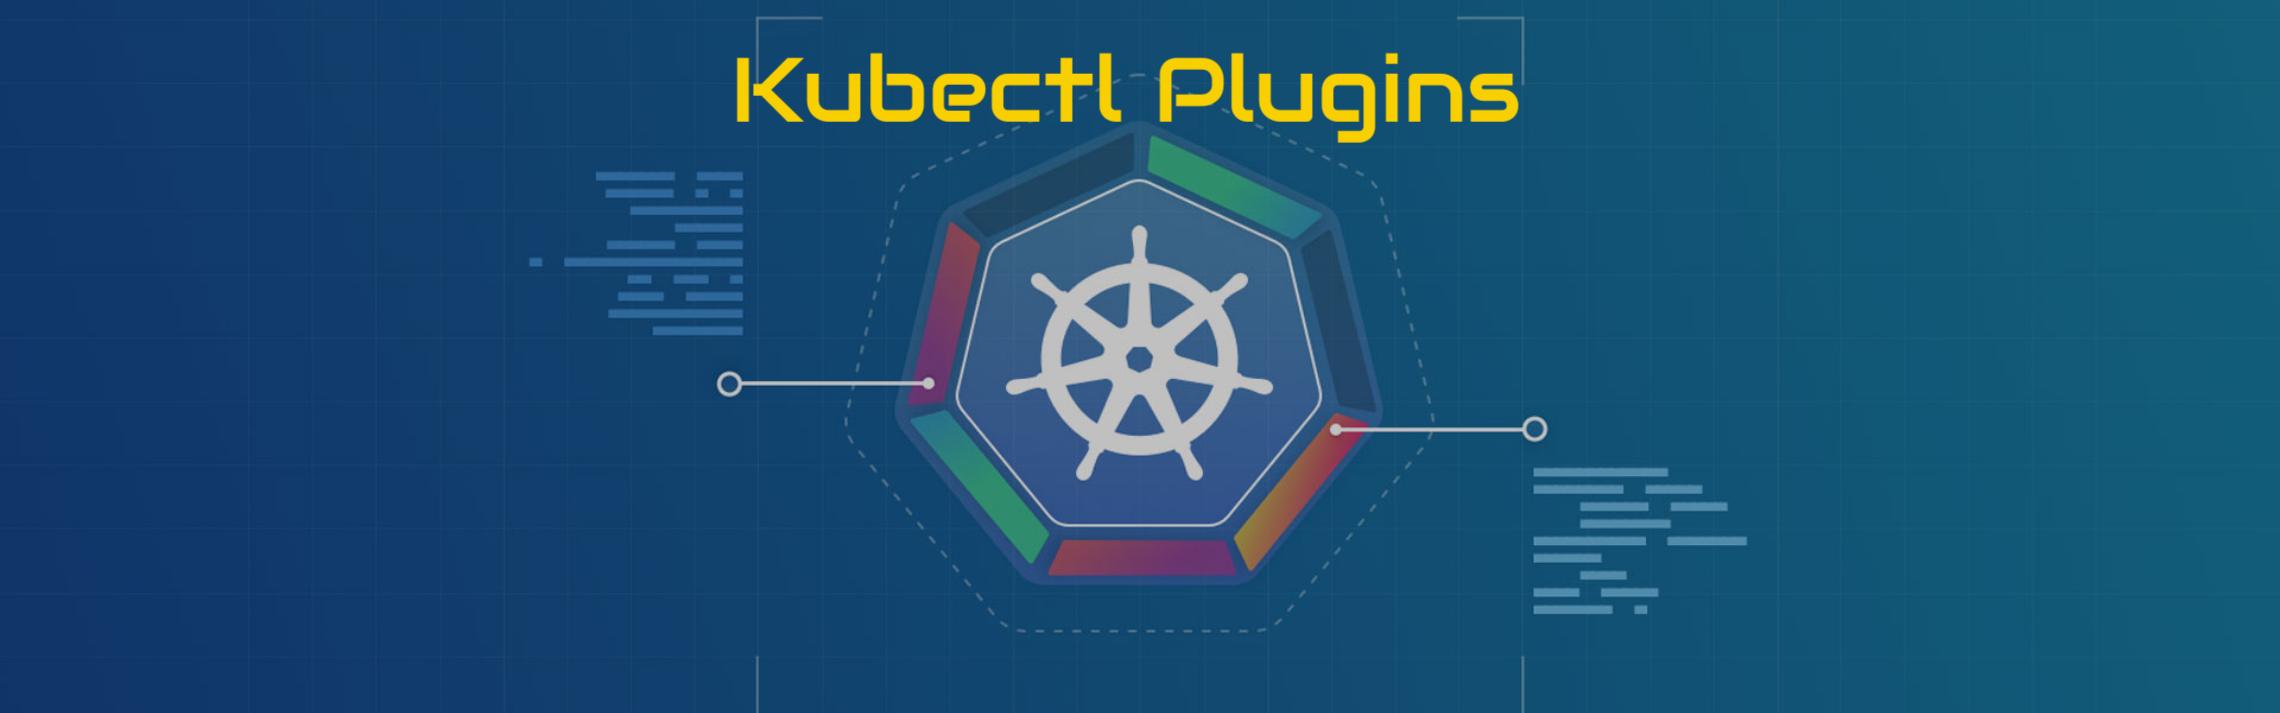 kubectl-plugins